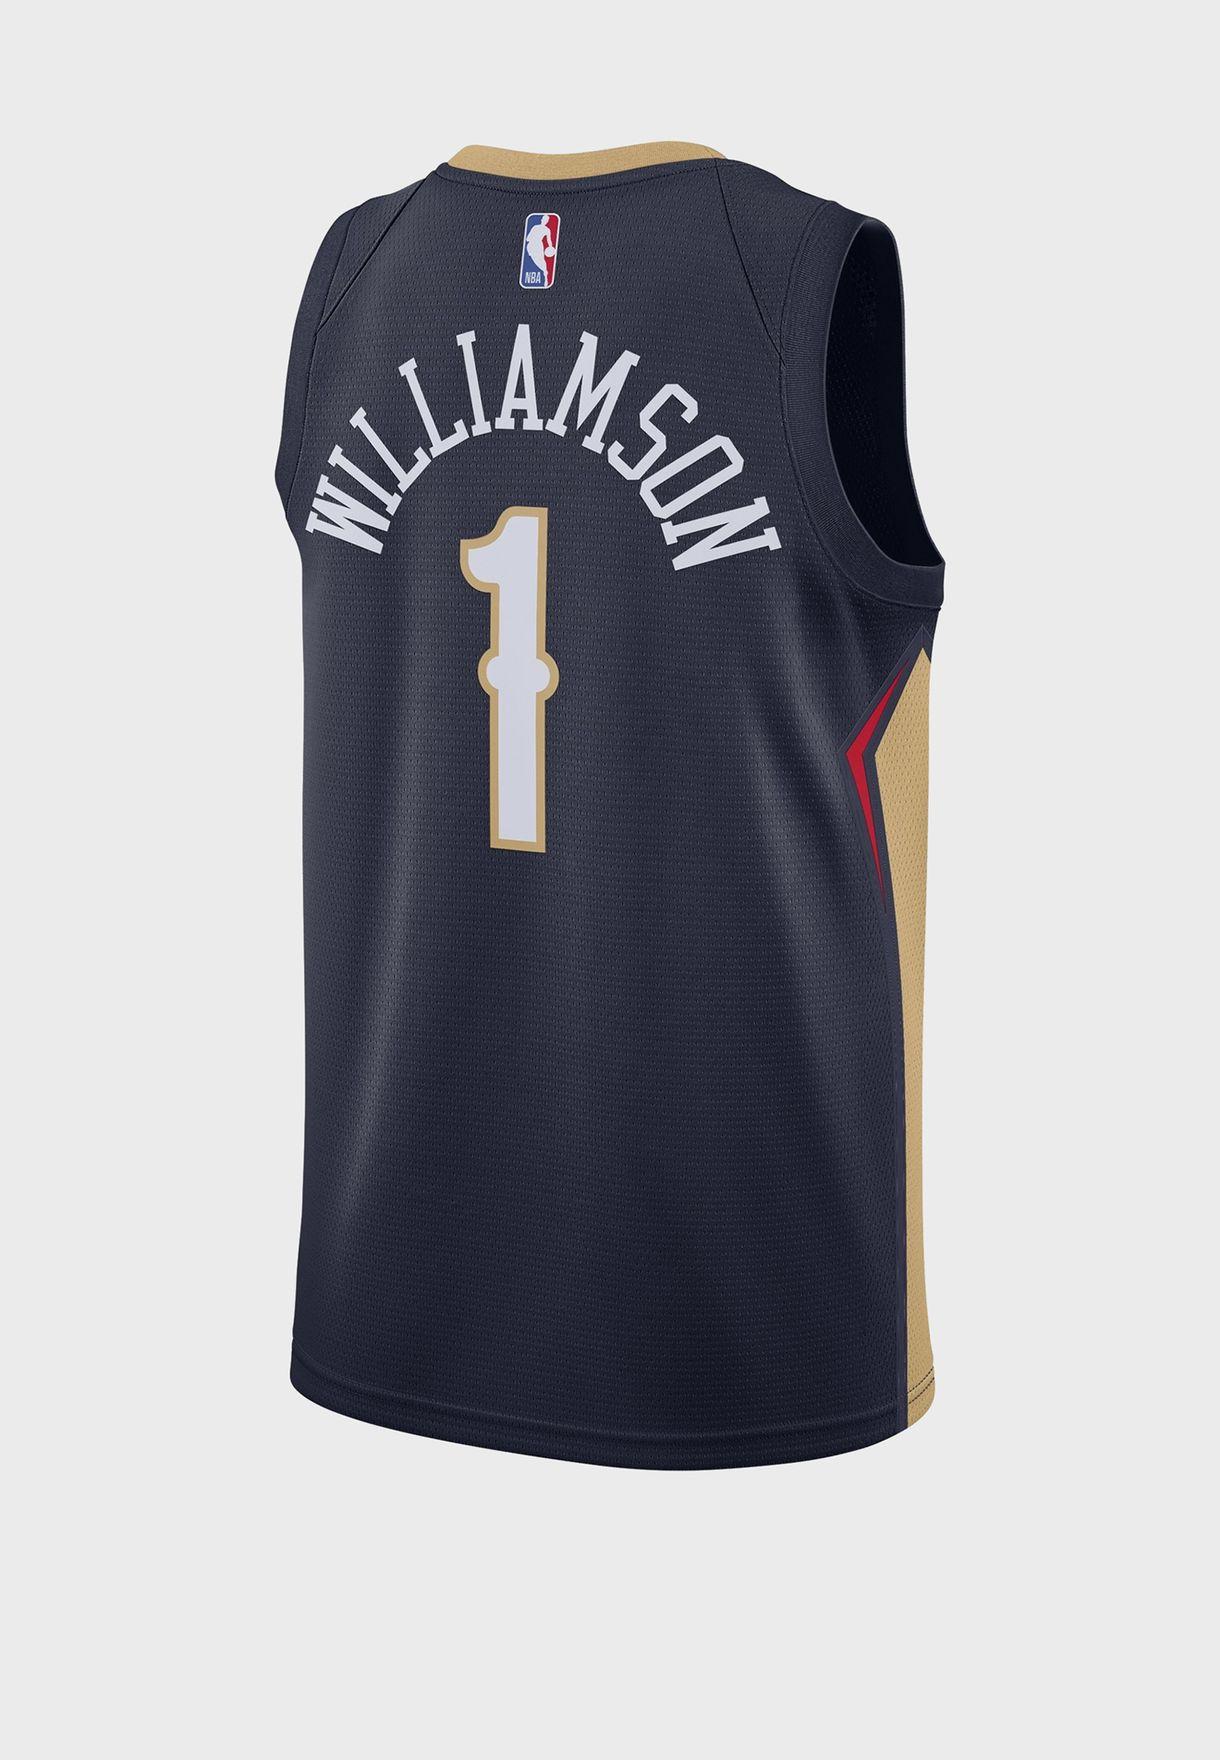 Zion Williamson New Orleans Pelicans Swingman Jersey